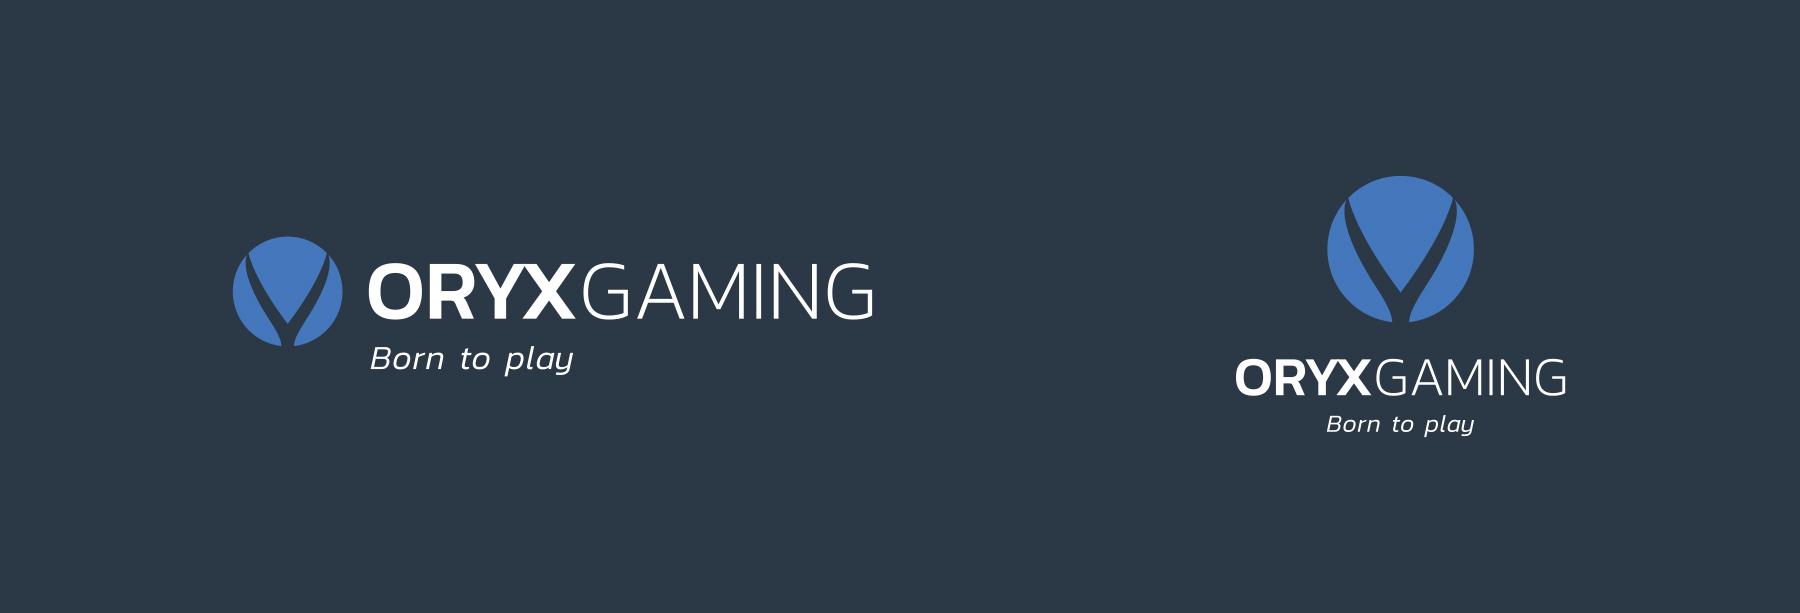 oryx_gaming_03.jpg